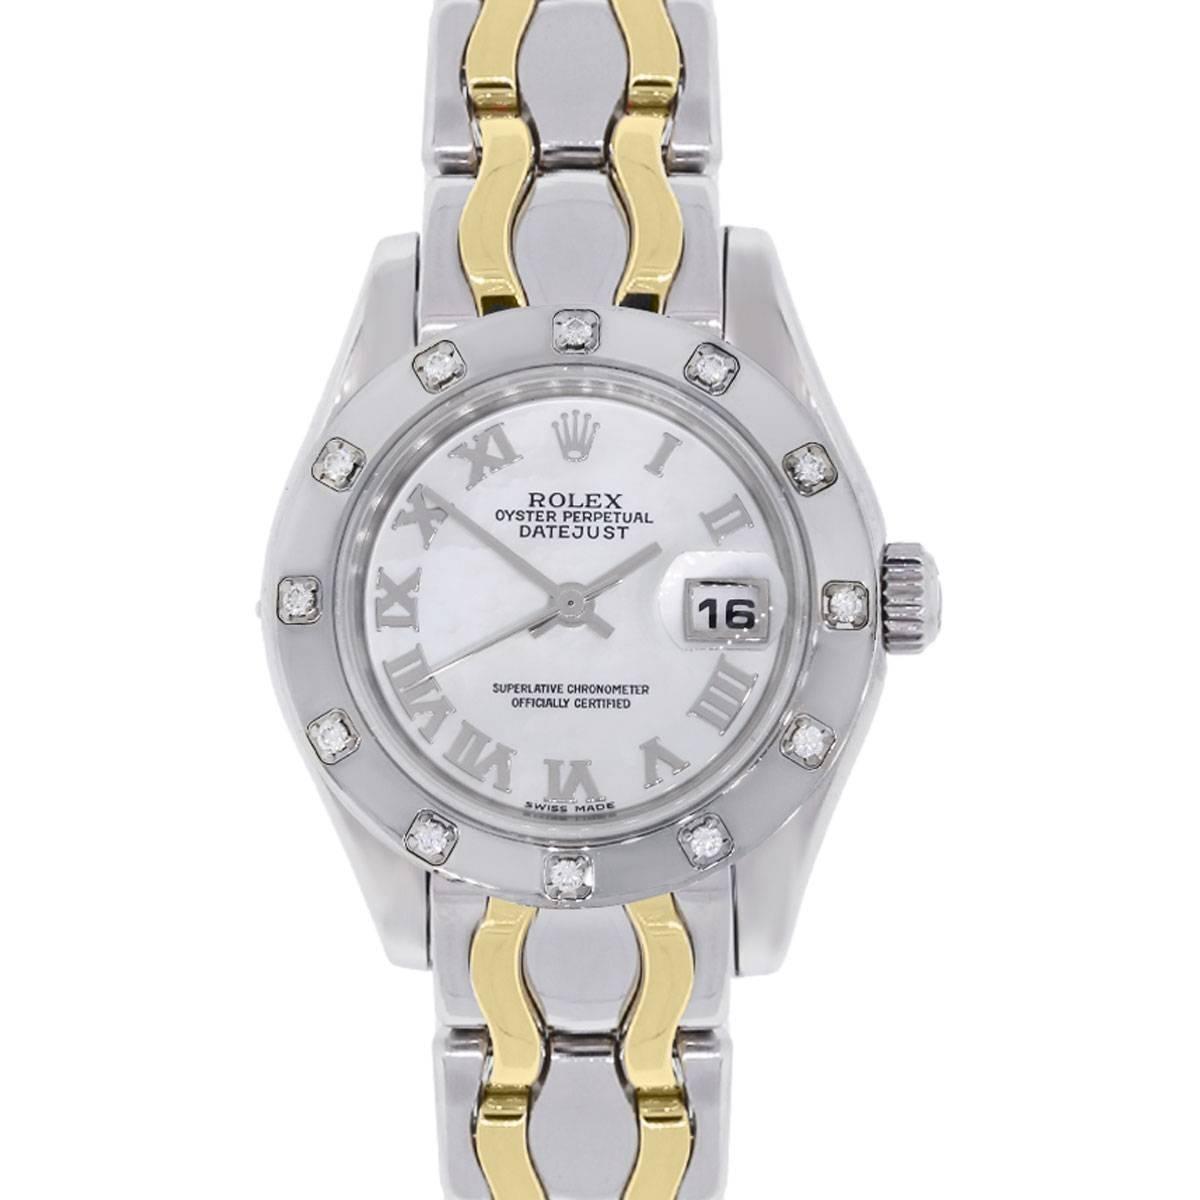 Rolex Datejust PearlMaster Automatic Wristwatch Ref 80319